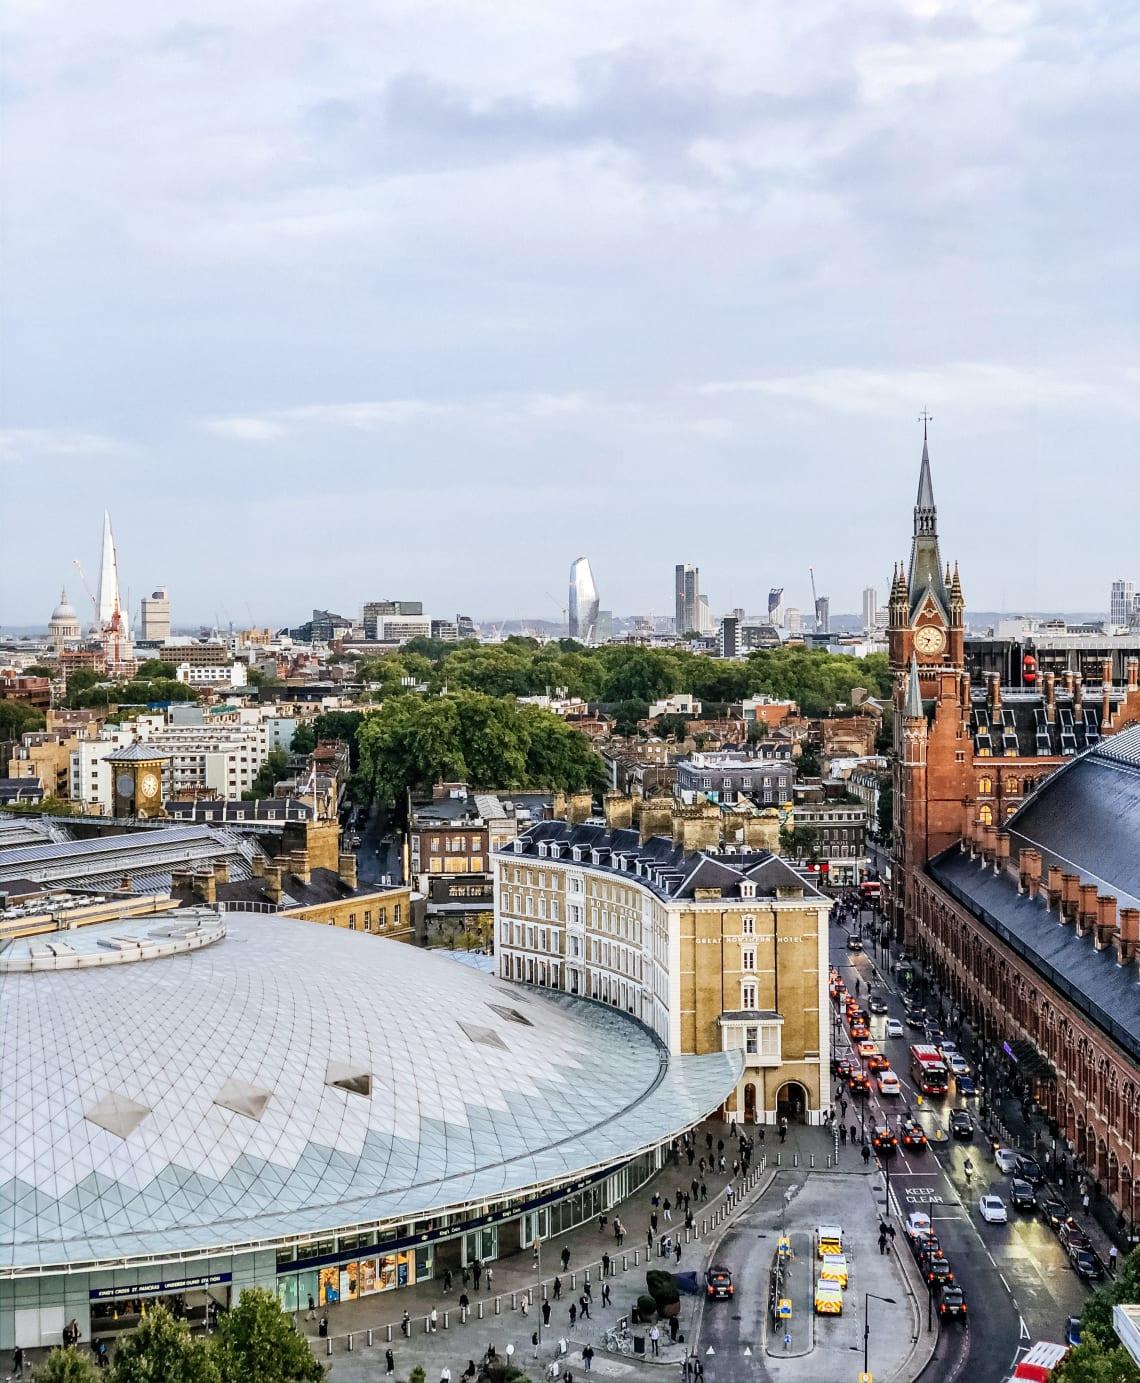 King's Cross and St Pancras International, London, UK